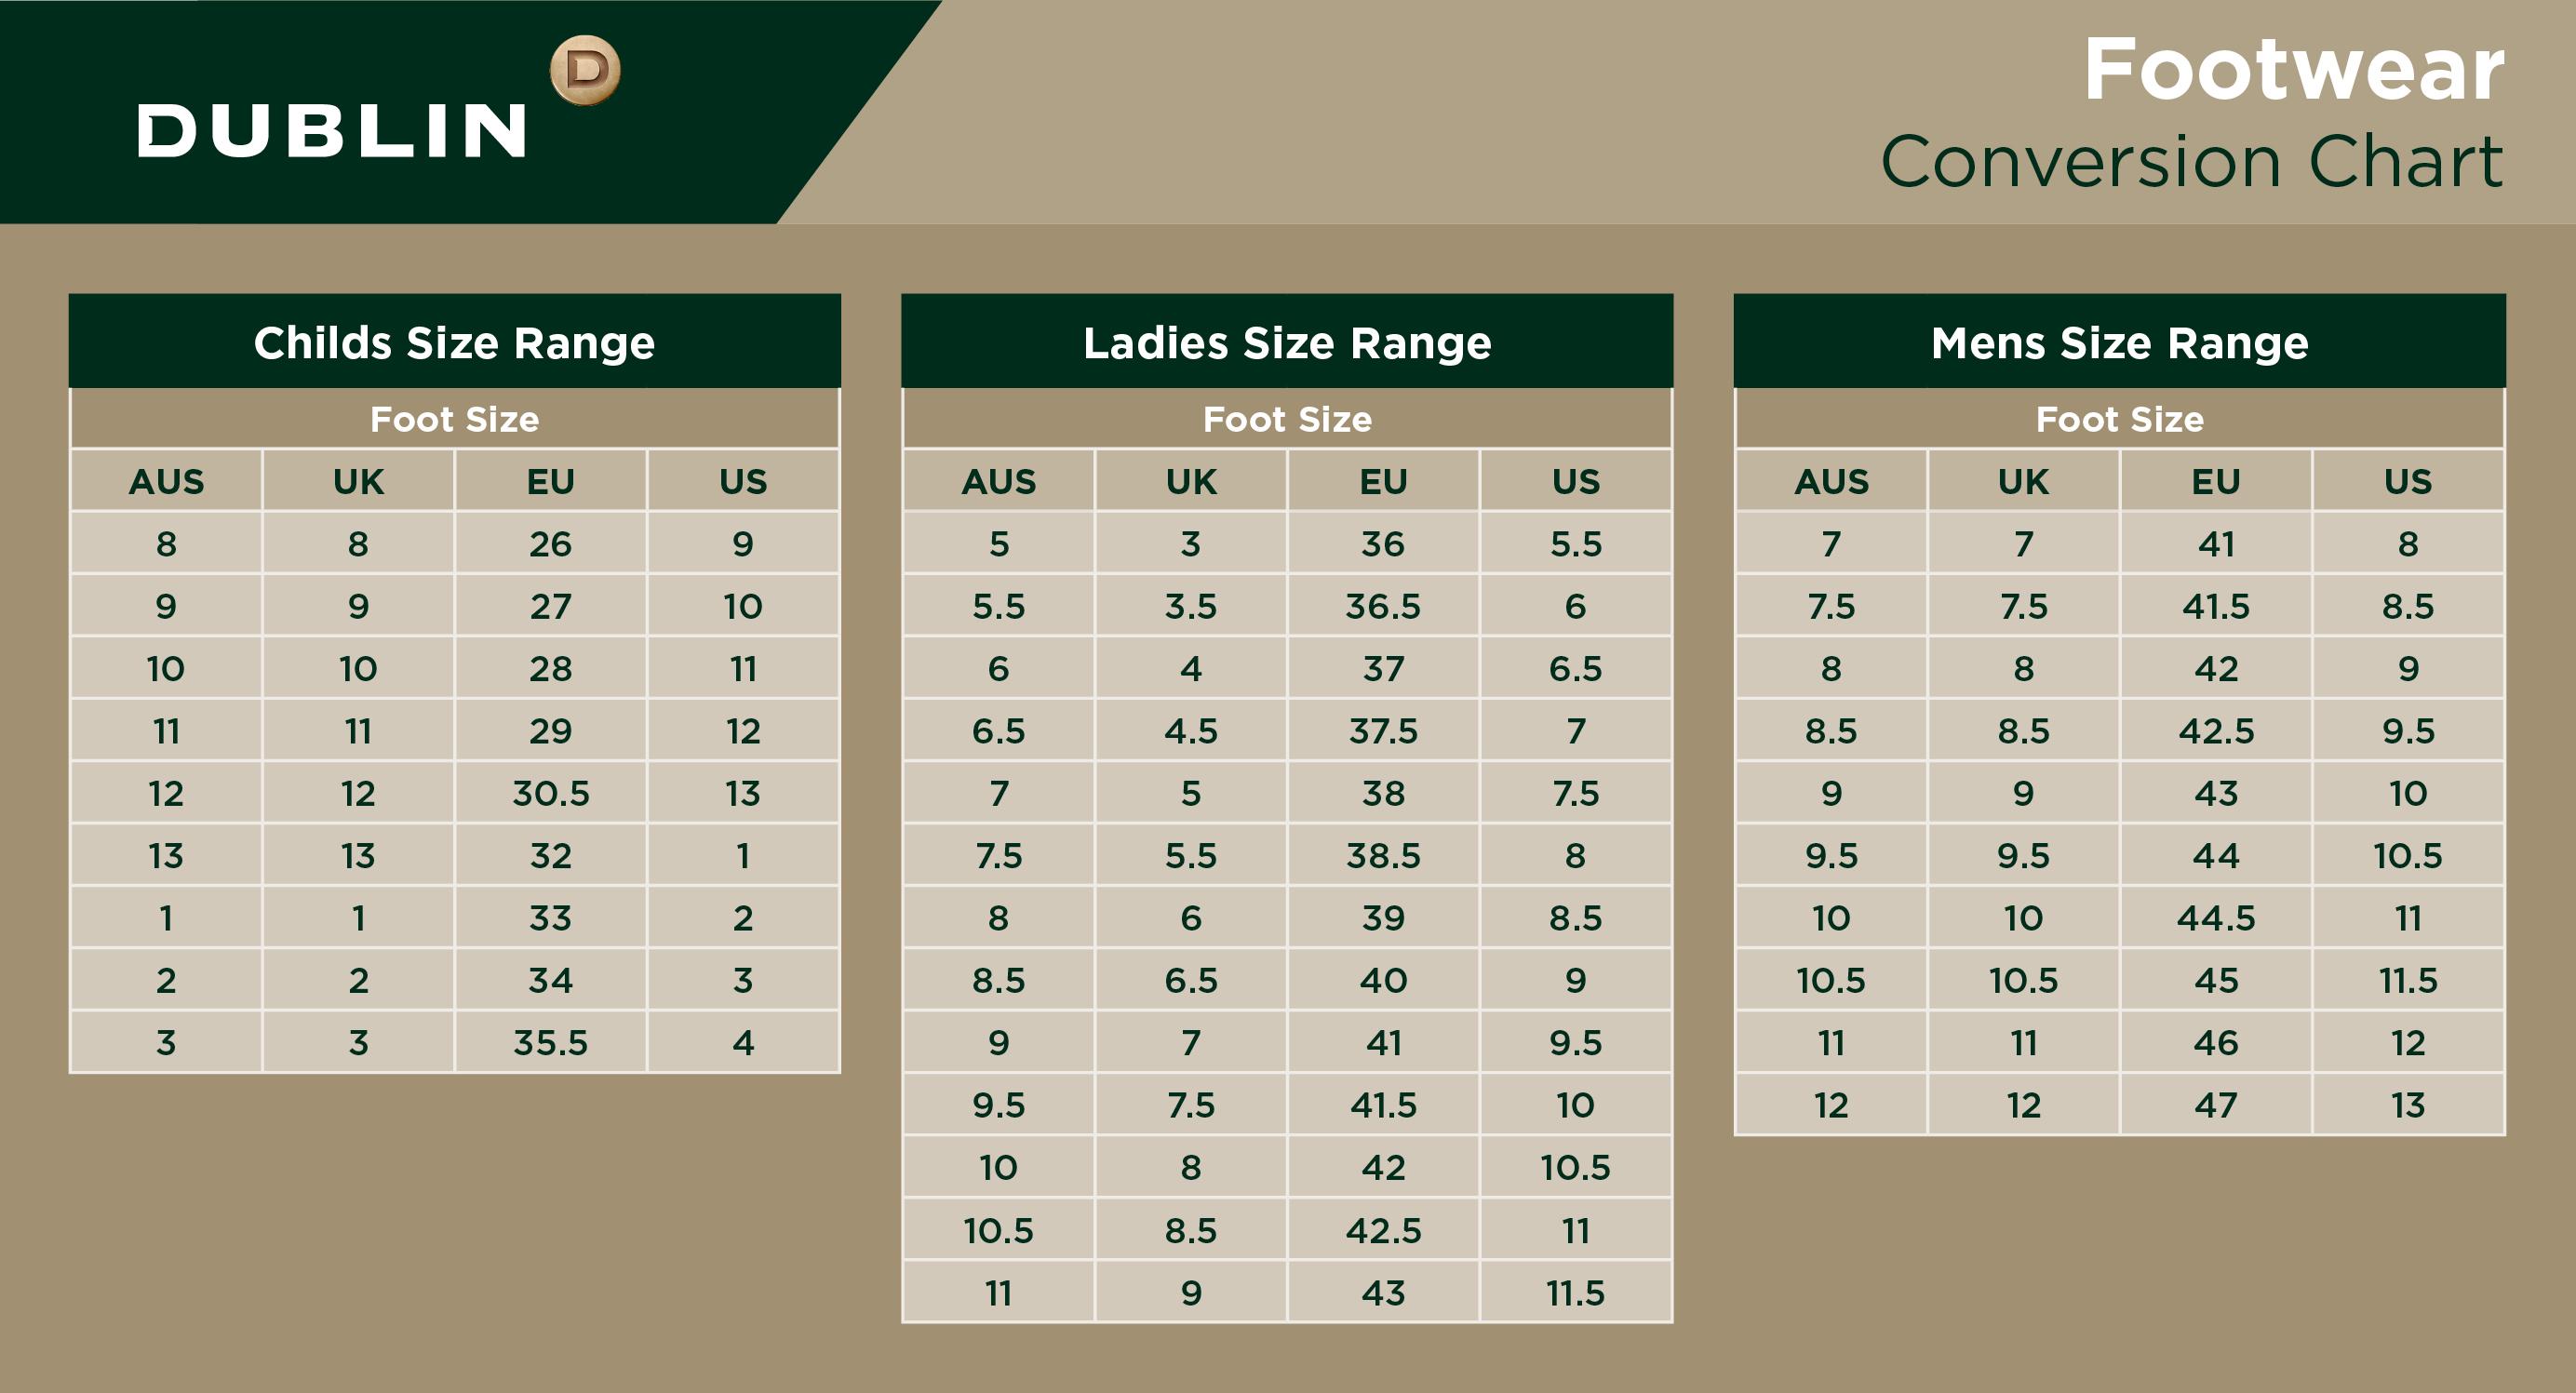 Dublin Footwear Conversion Chart